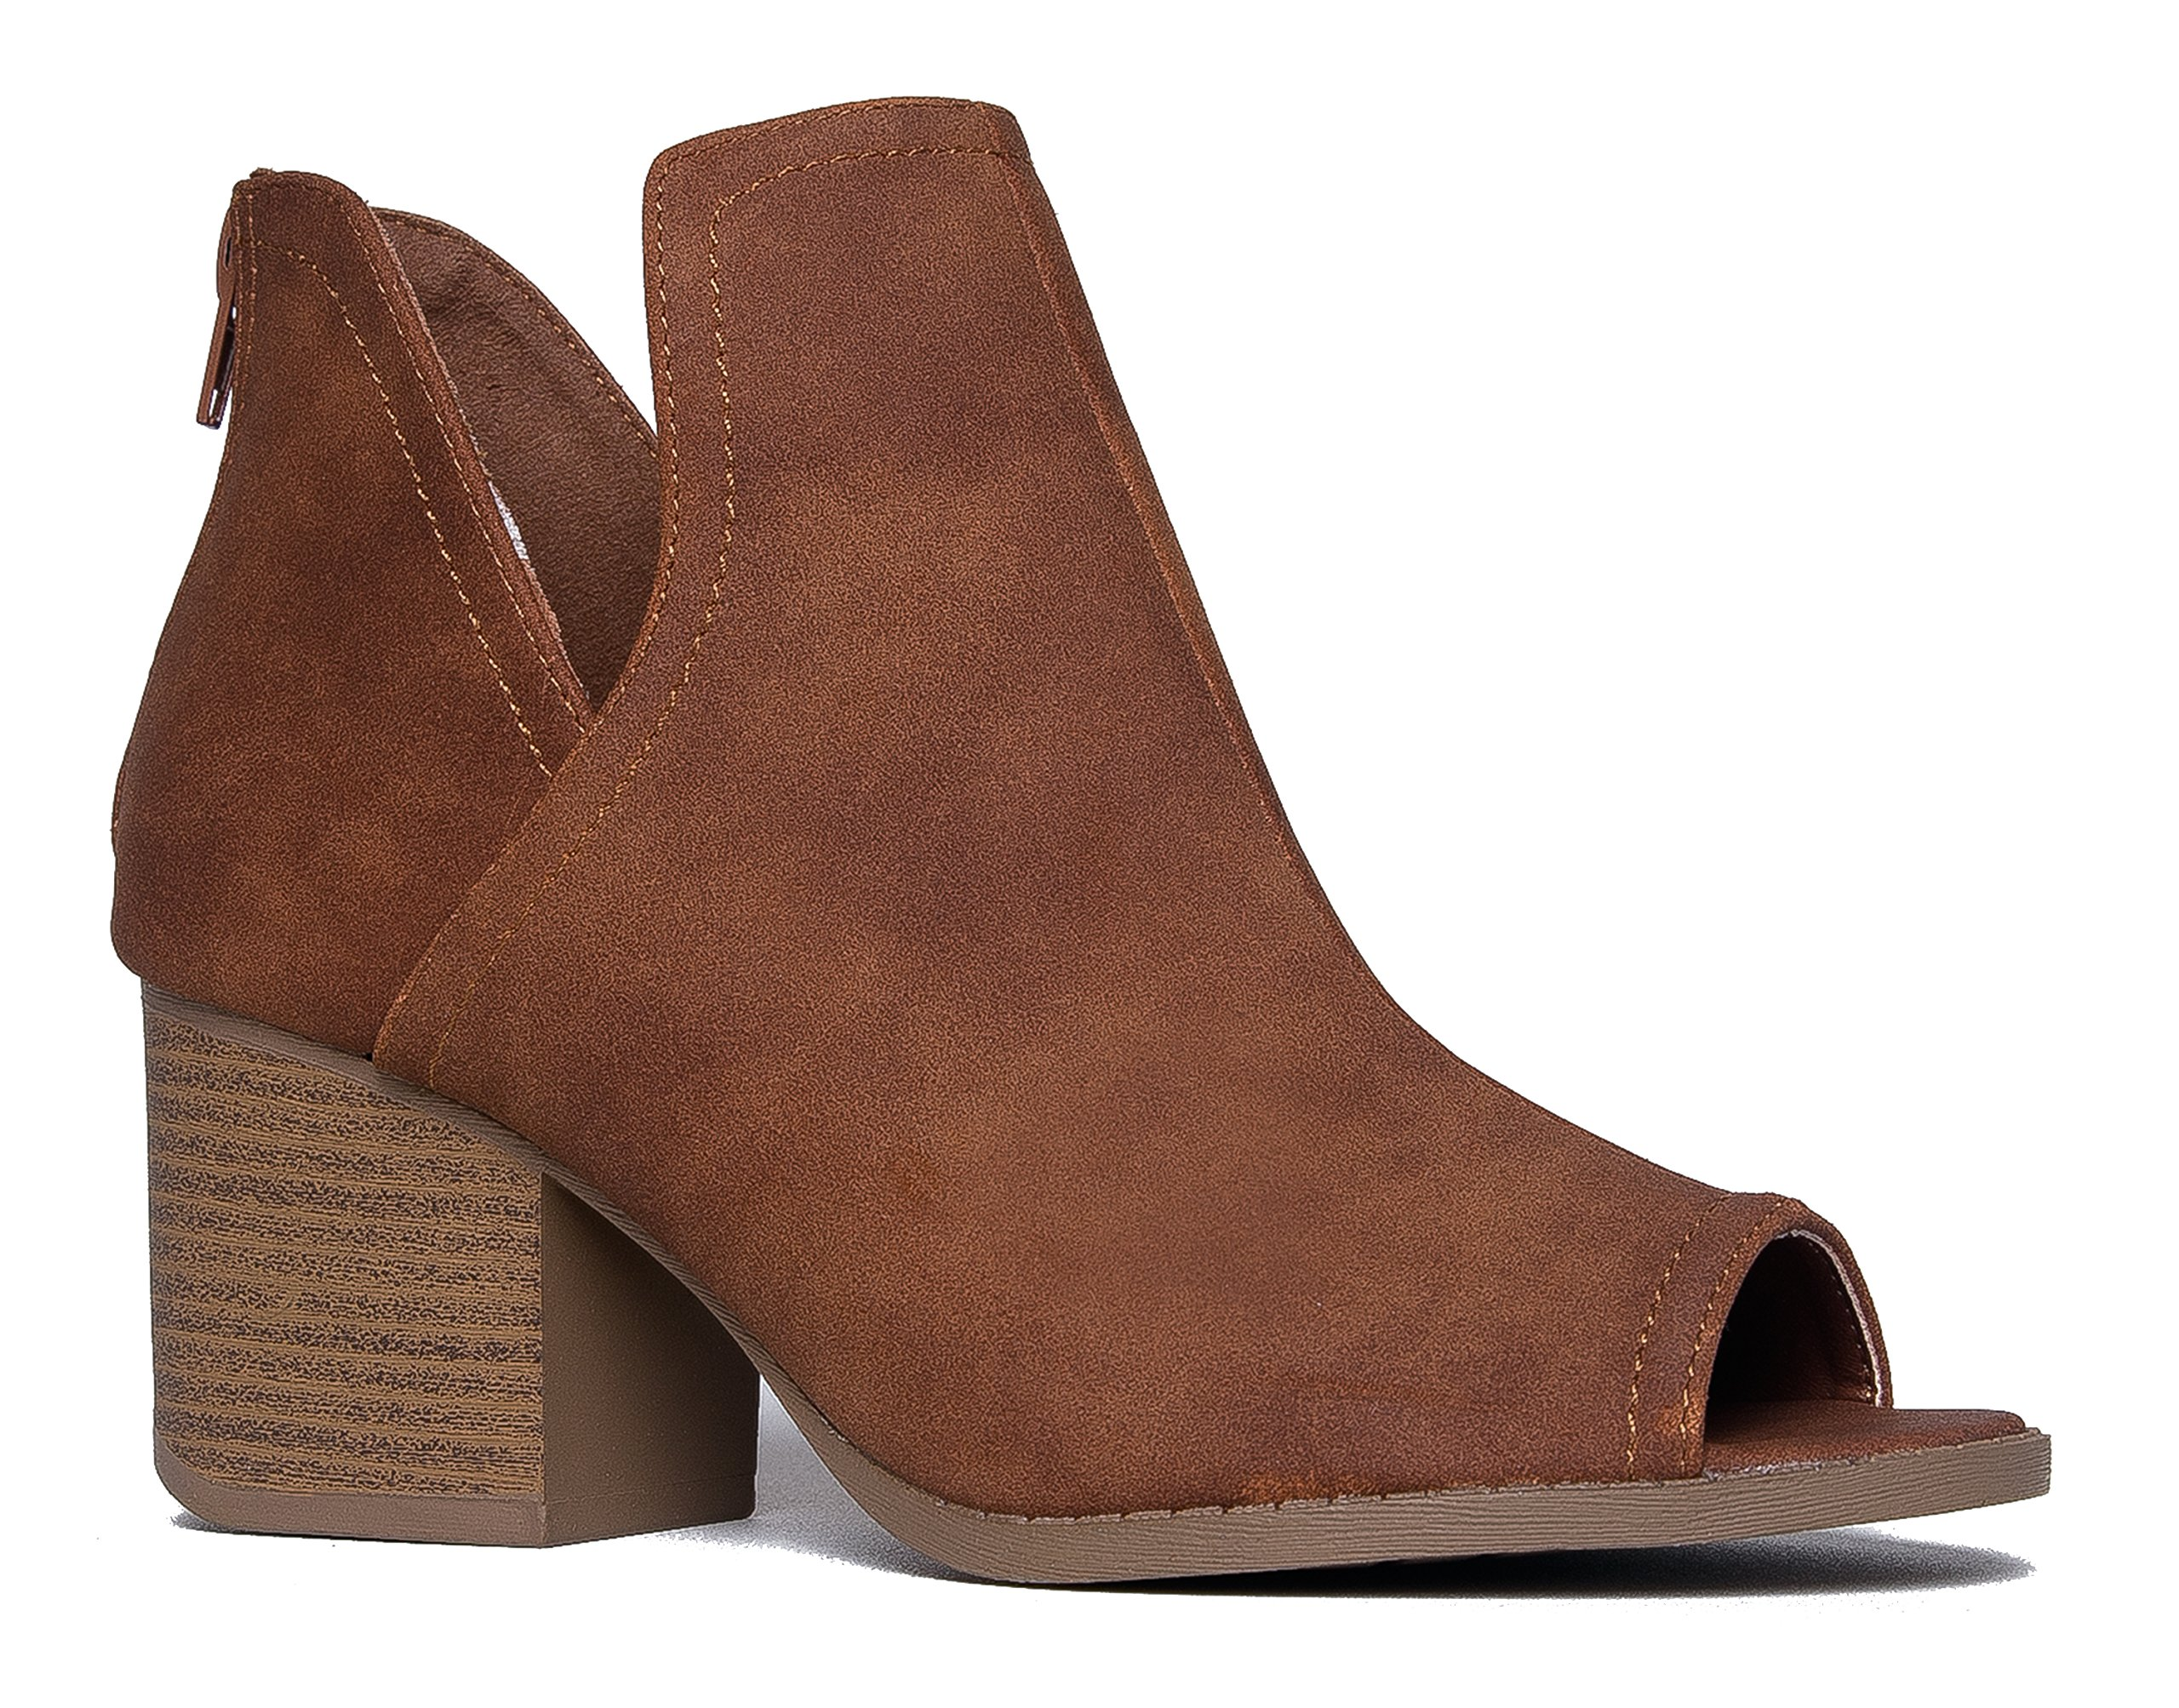 Western Low Ankle Boot, Cognac PU, 8.5 B(M) US